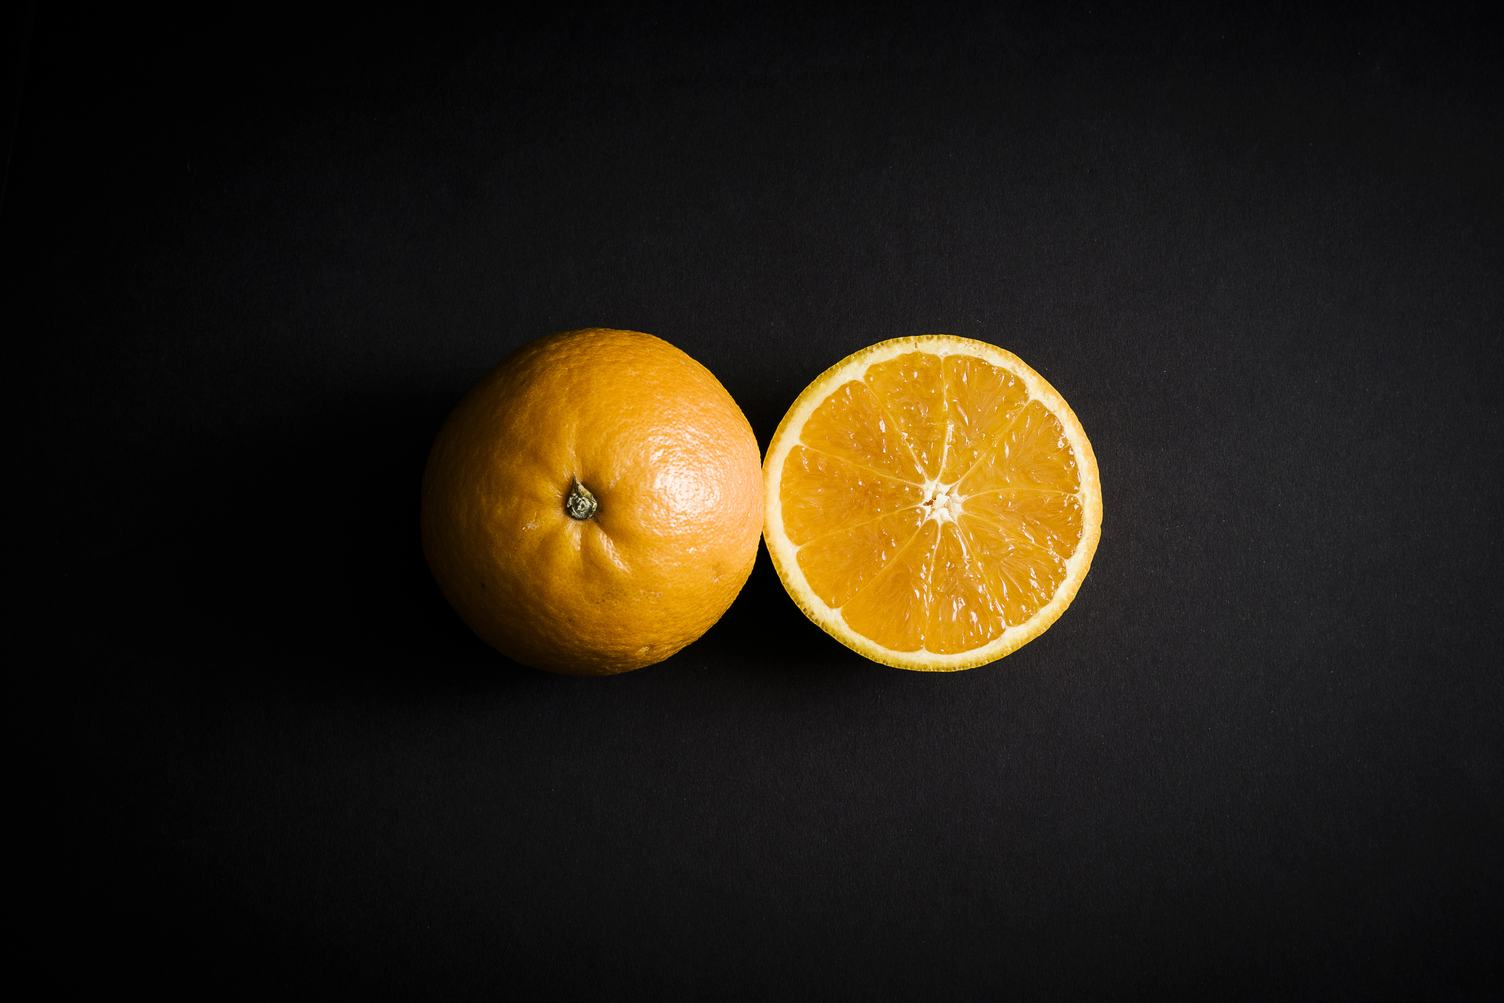 Orange Fruit Cut in Half on Black